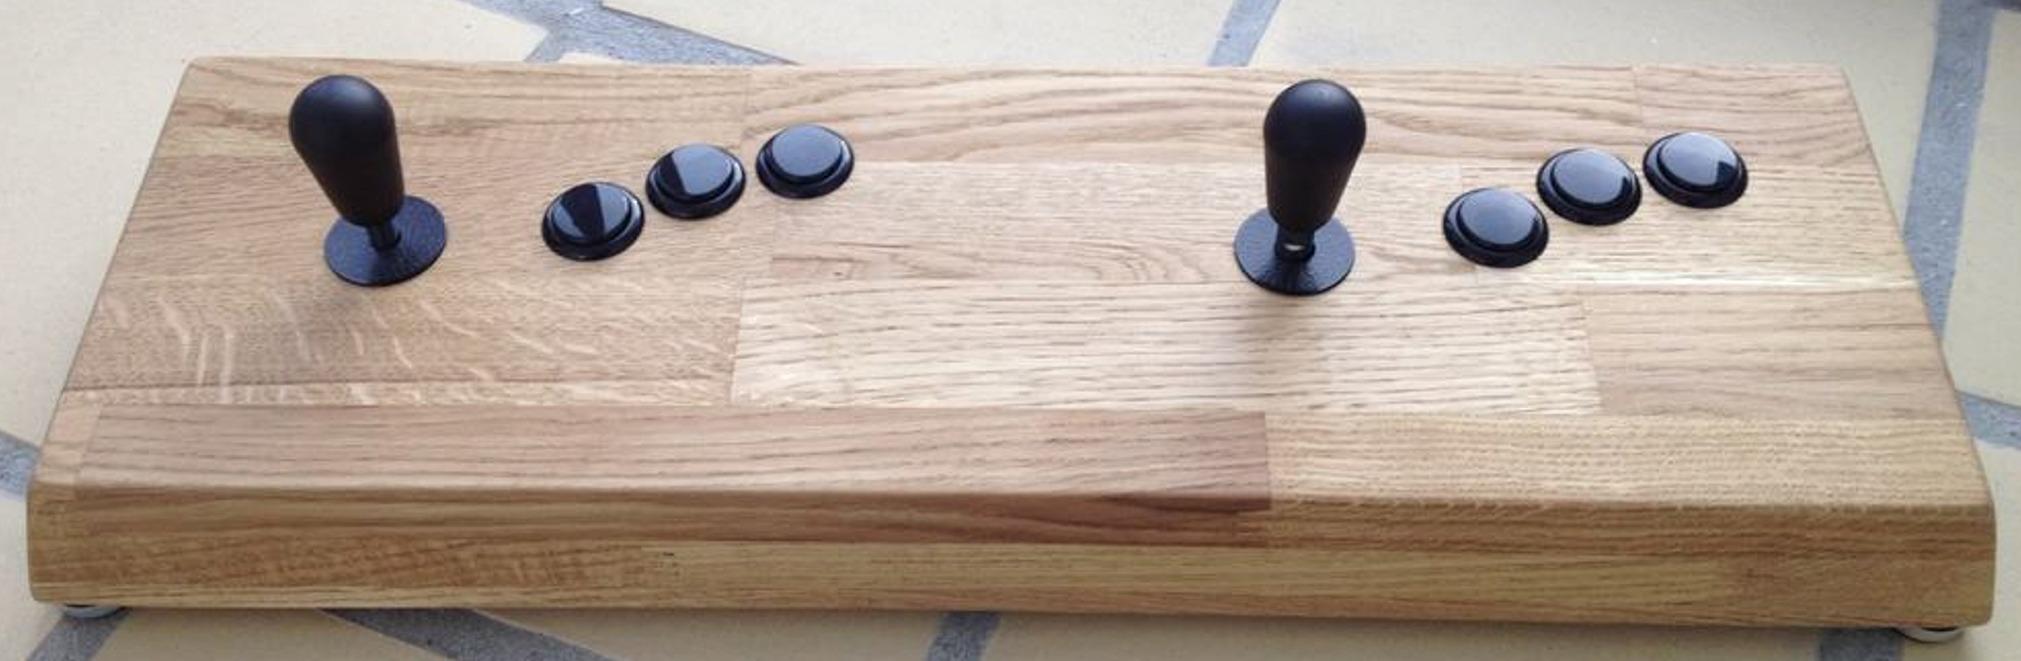 Woody fight stick II arcade fight stick made from oak wood using Seimitsu buttons and Sanwa joysticks